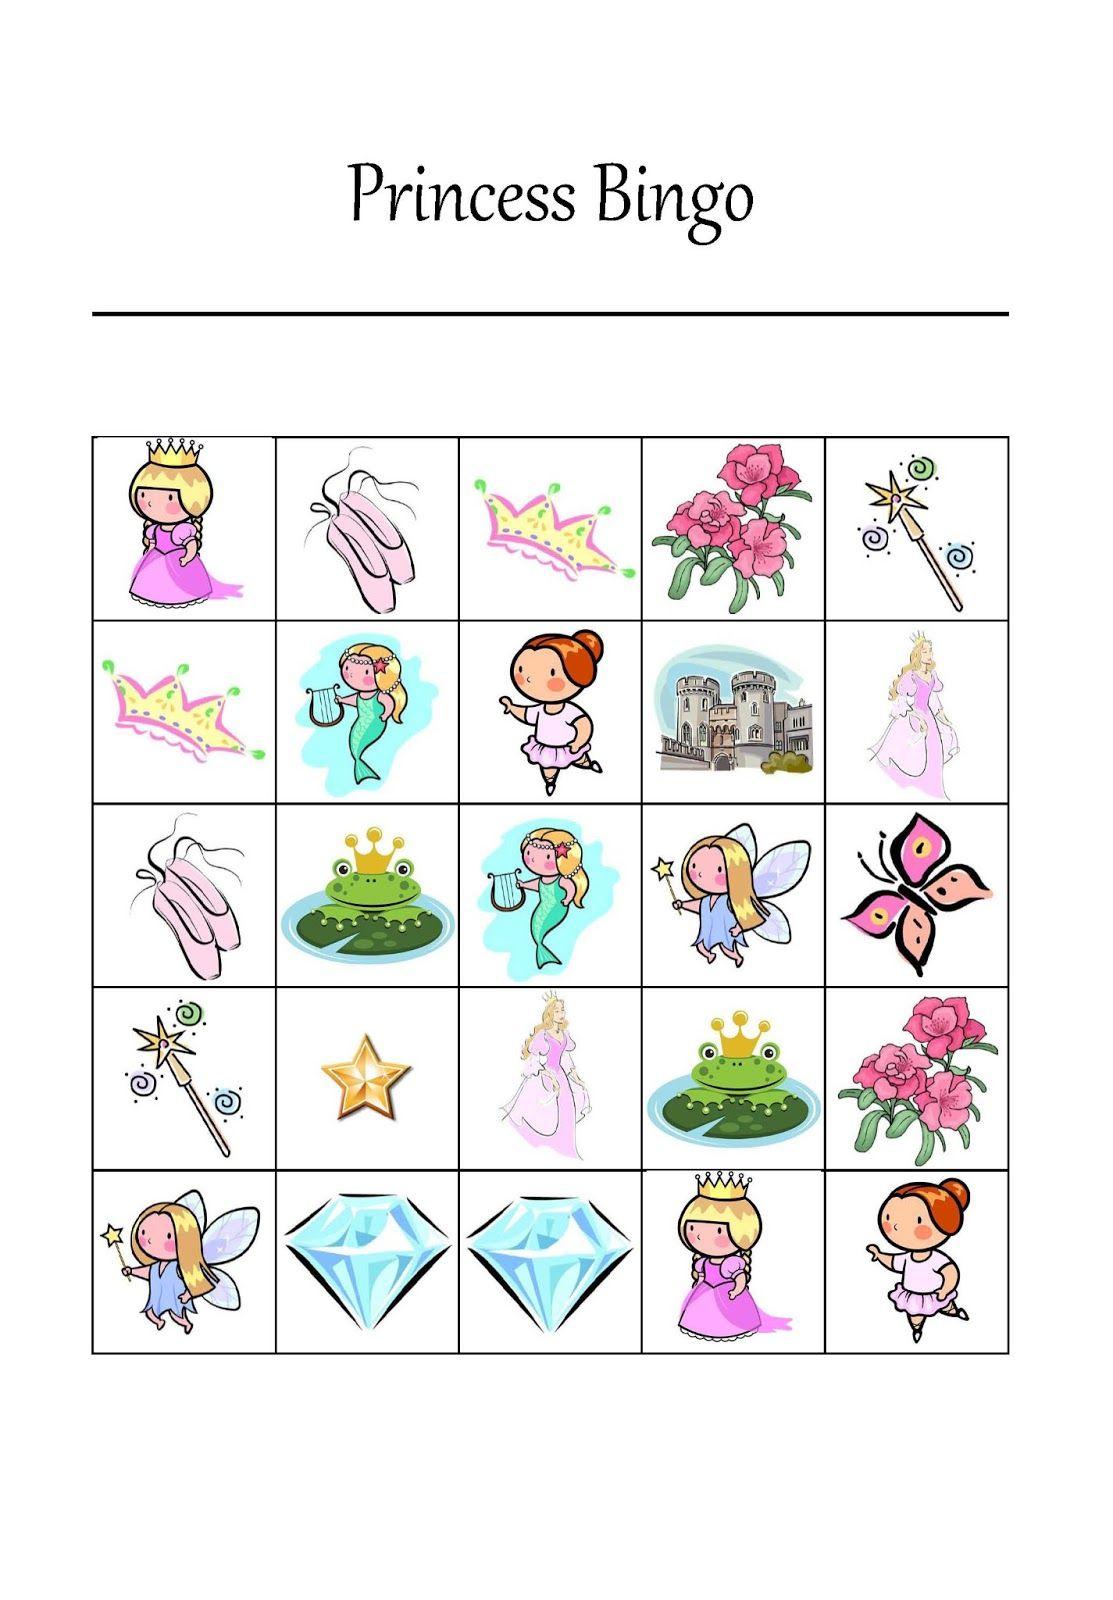 It's A Princess Thing: Free Printable Princess Bingo Game | Party - Free Printable Tea Party Games